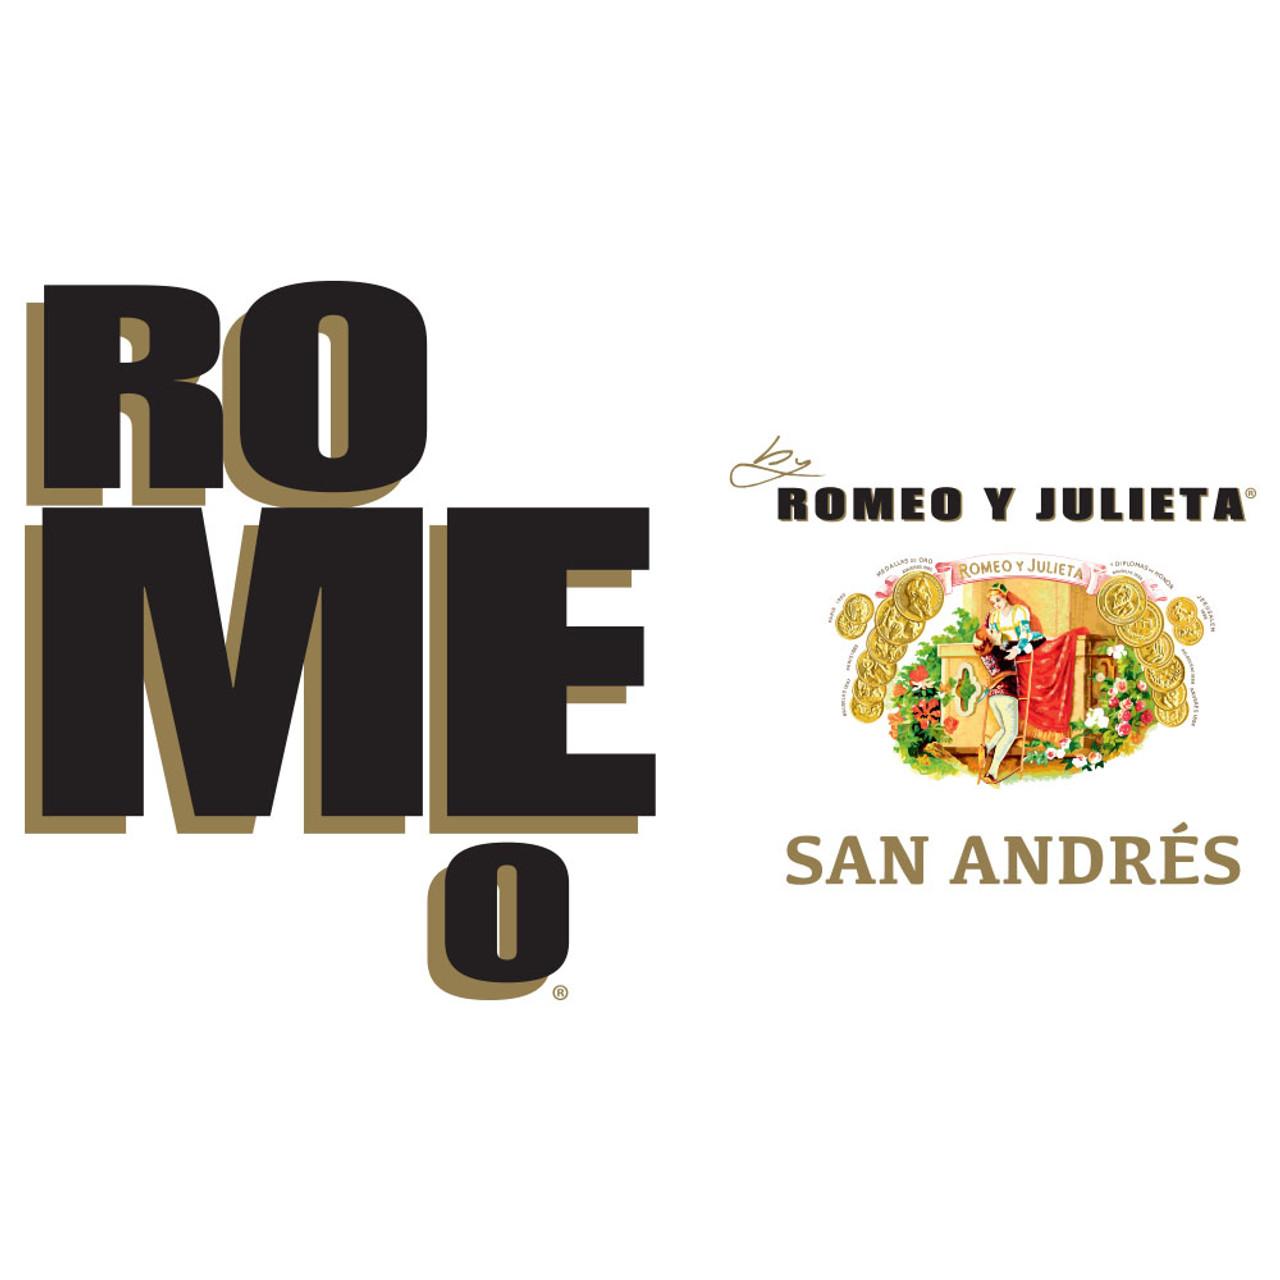 Romeo San Andres by Romeo y Julieta Piramide Cigars - 6.12 x 52 (Box of 20)